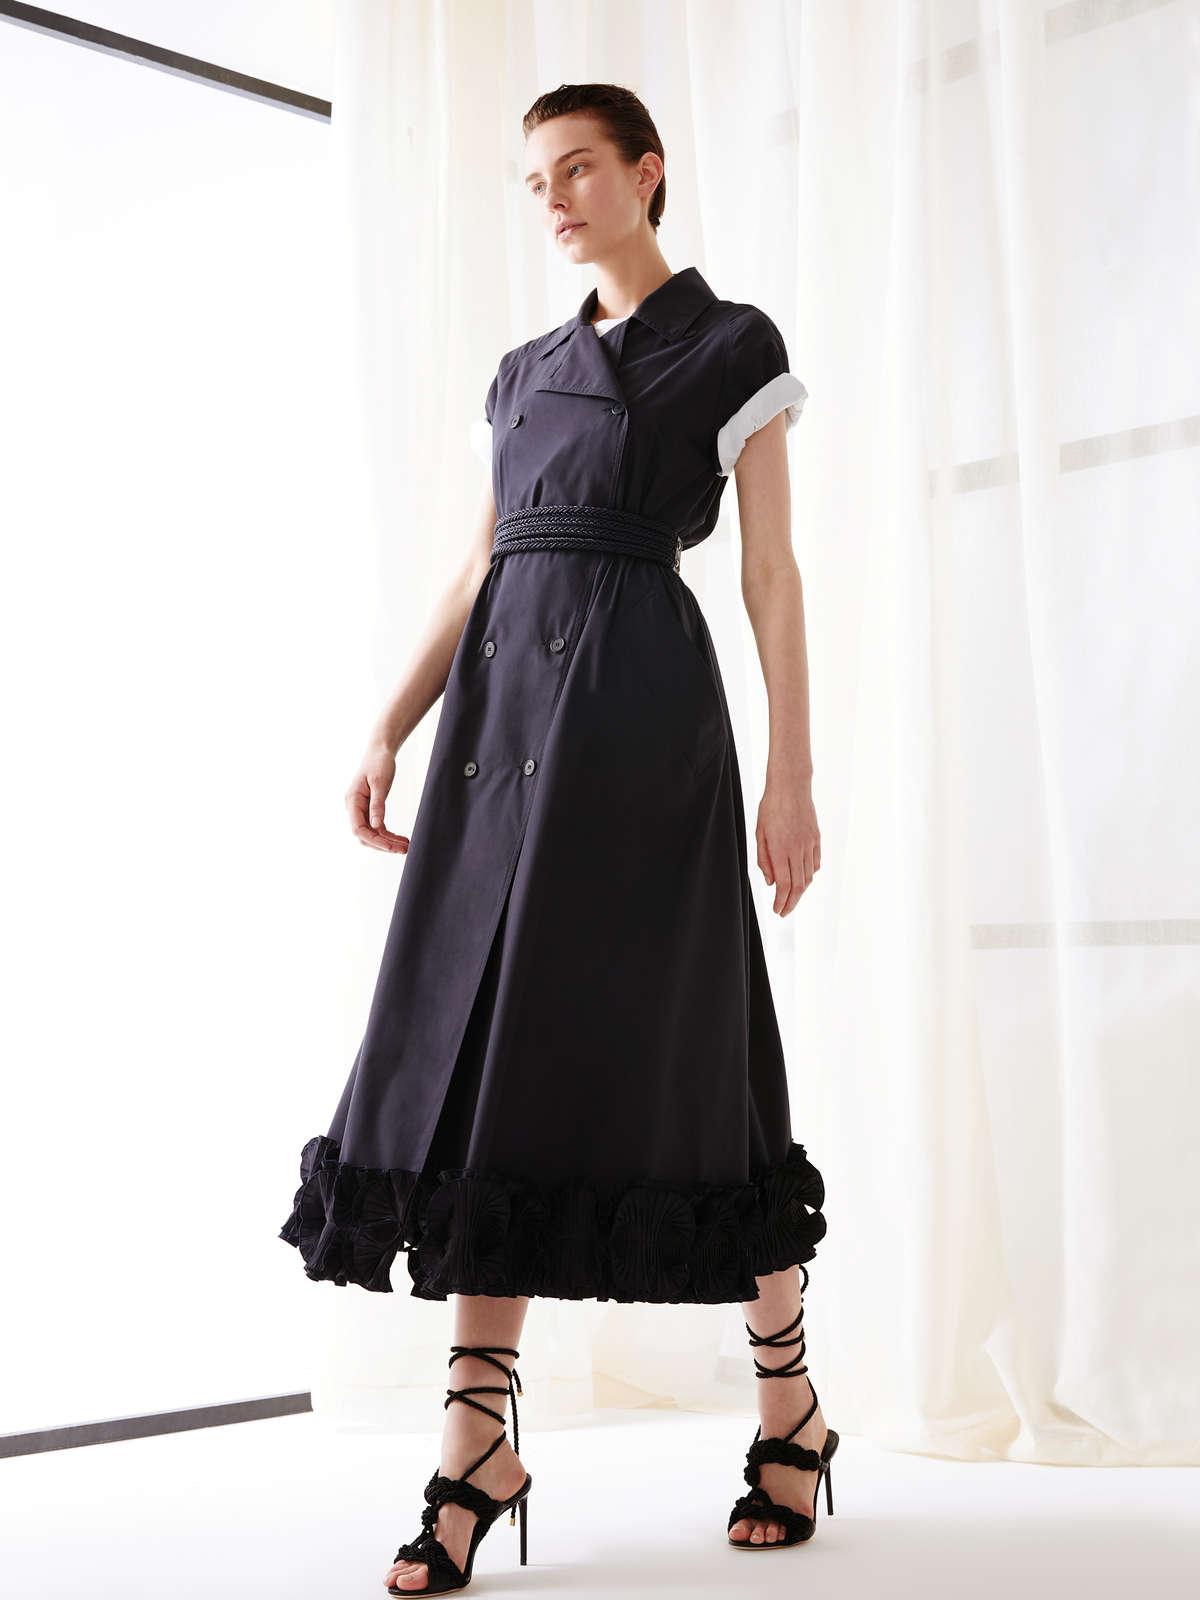 af49870c8a9c Elegant Outfits and Dresses